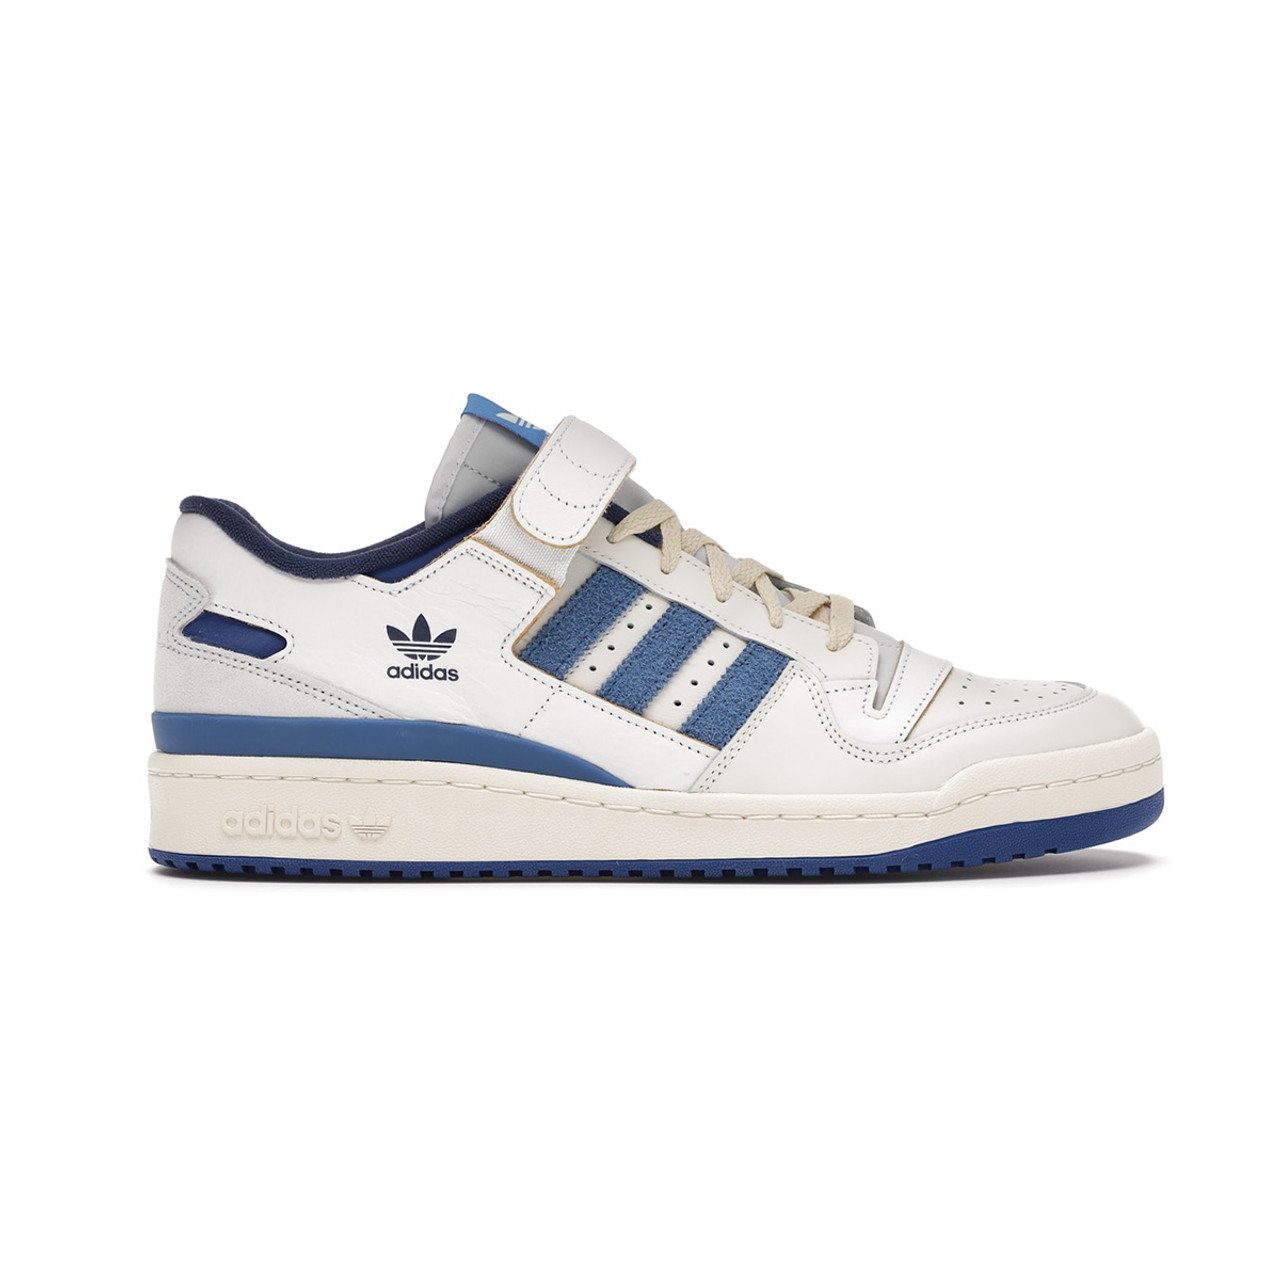 Adidas Forum 20 Low OG Bright Blue/ White/ Cream Tan/ Blue Men ...